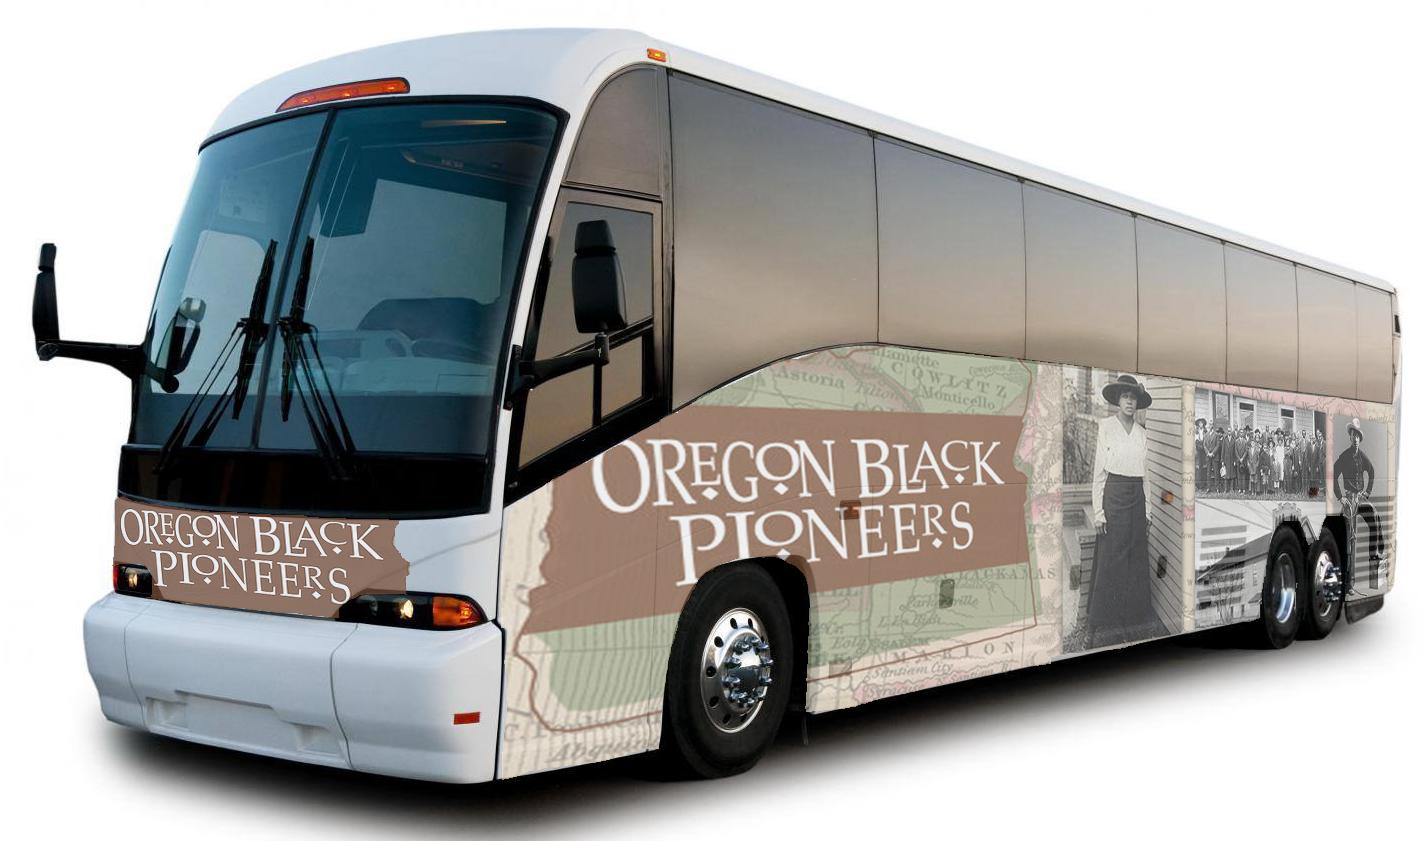 Oregon Black Pioneers (OBP) Bus Tour